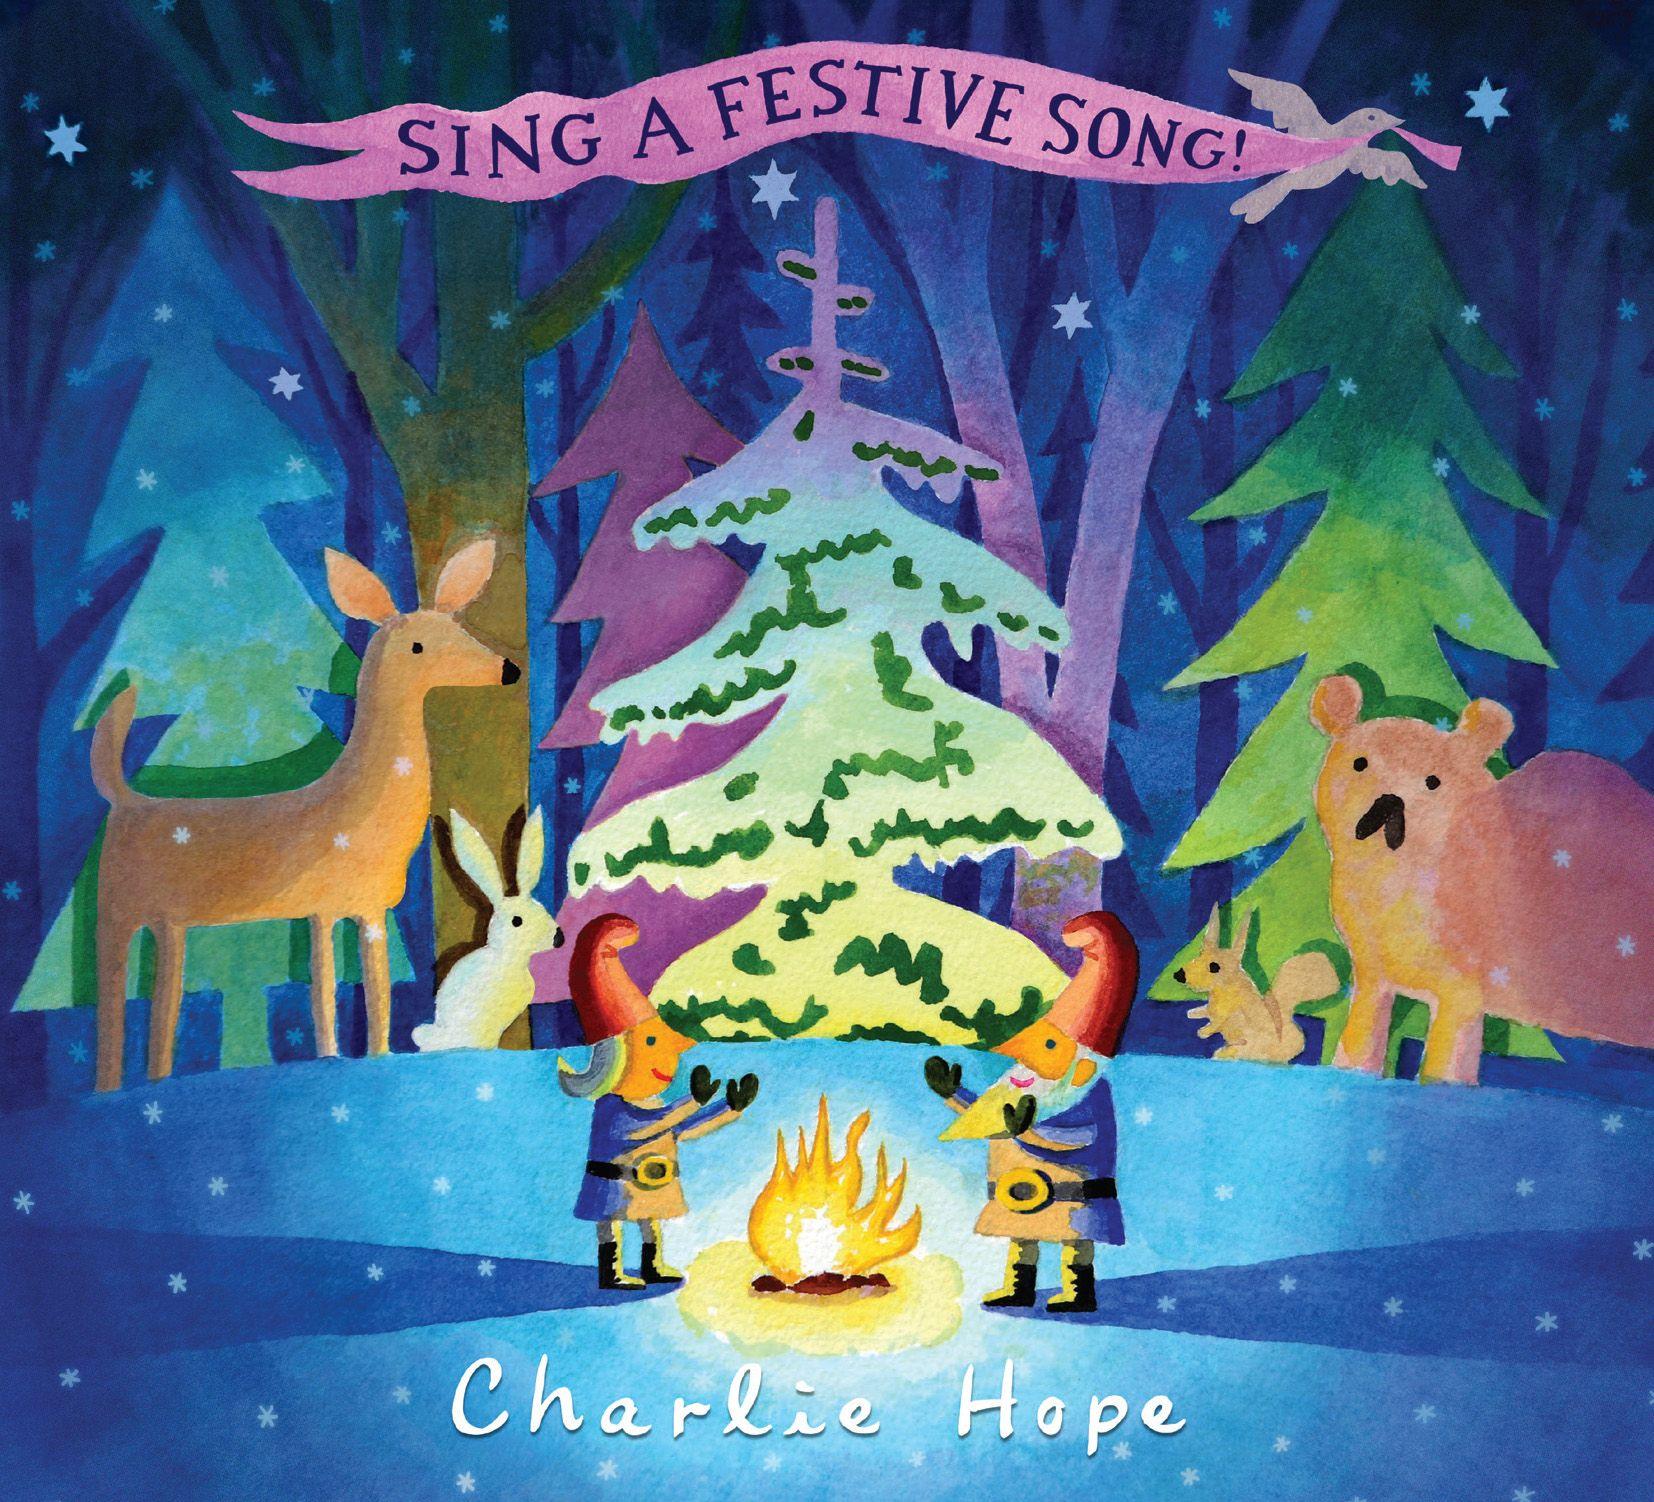 Sing a Festive Song! CD07.jpg